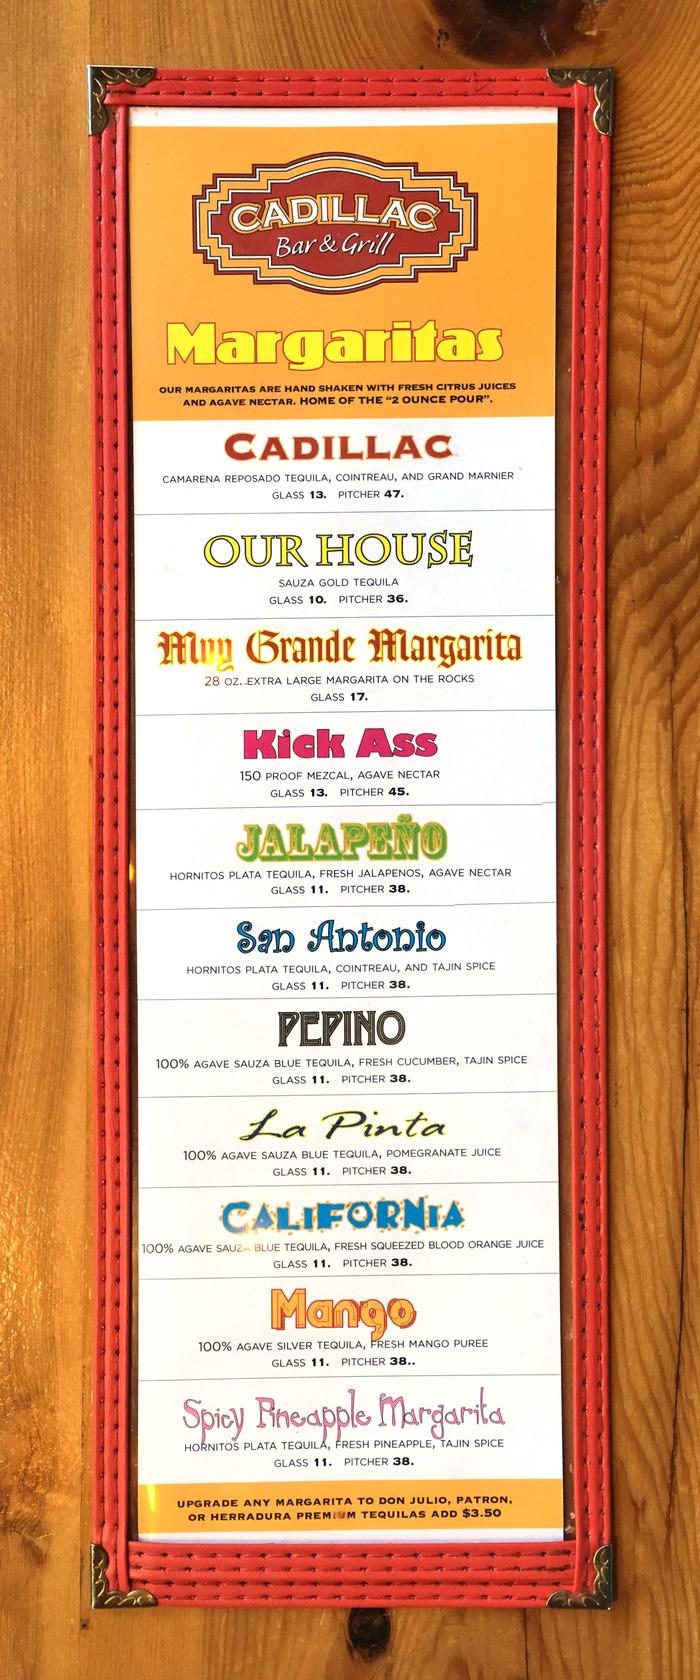 Cadillac Bar & Grill margaritas menu